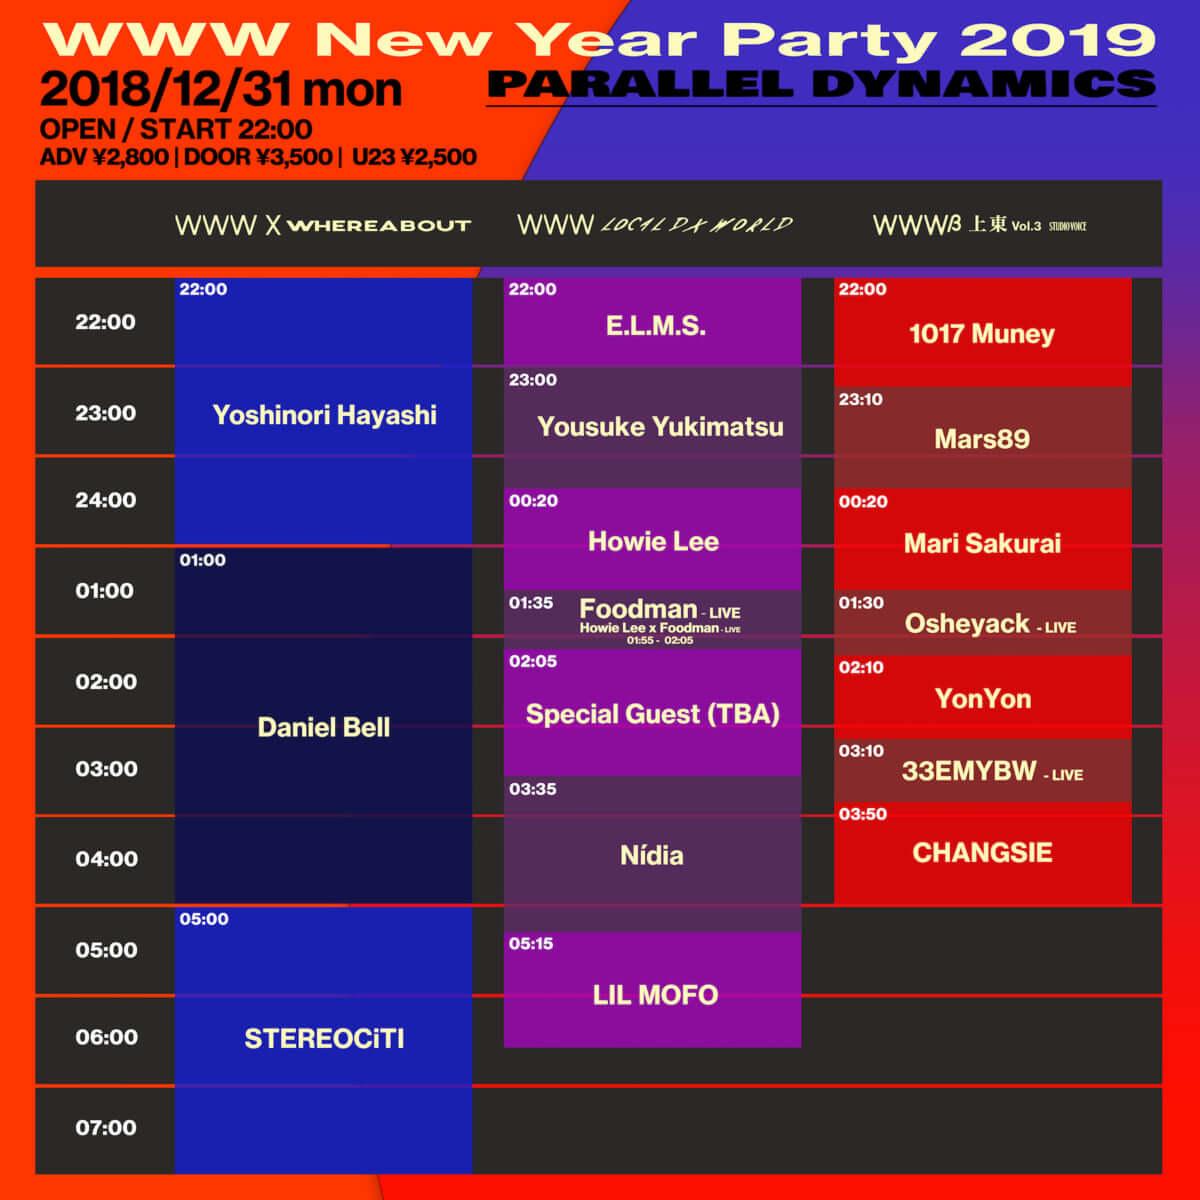 WWW New Year Partyのタイムテーブルが発表|スペシャル・ゲストも出演決定 muisc181228-www-new-year-party-2019-01-1200x1200